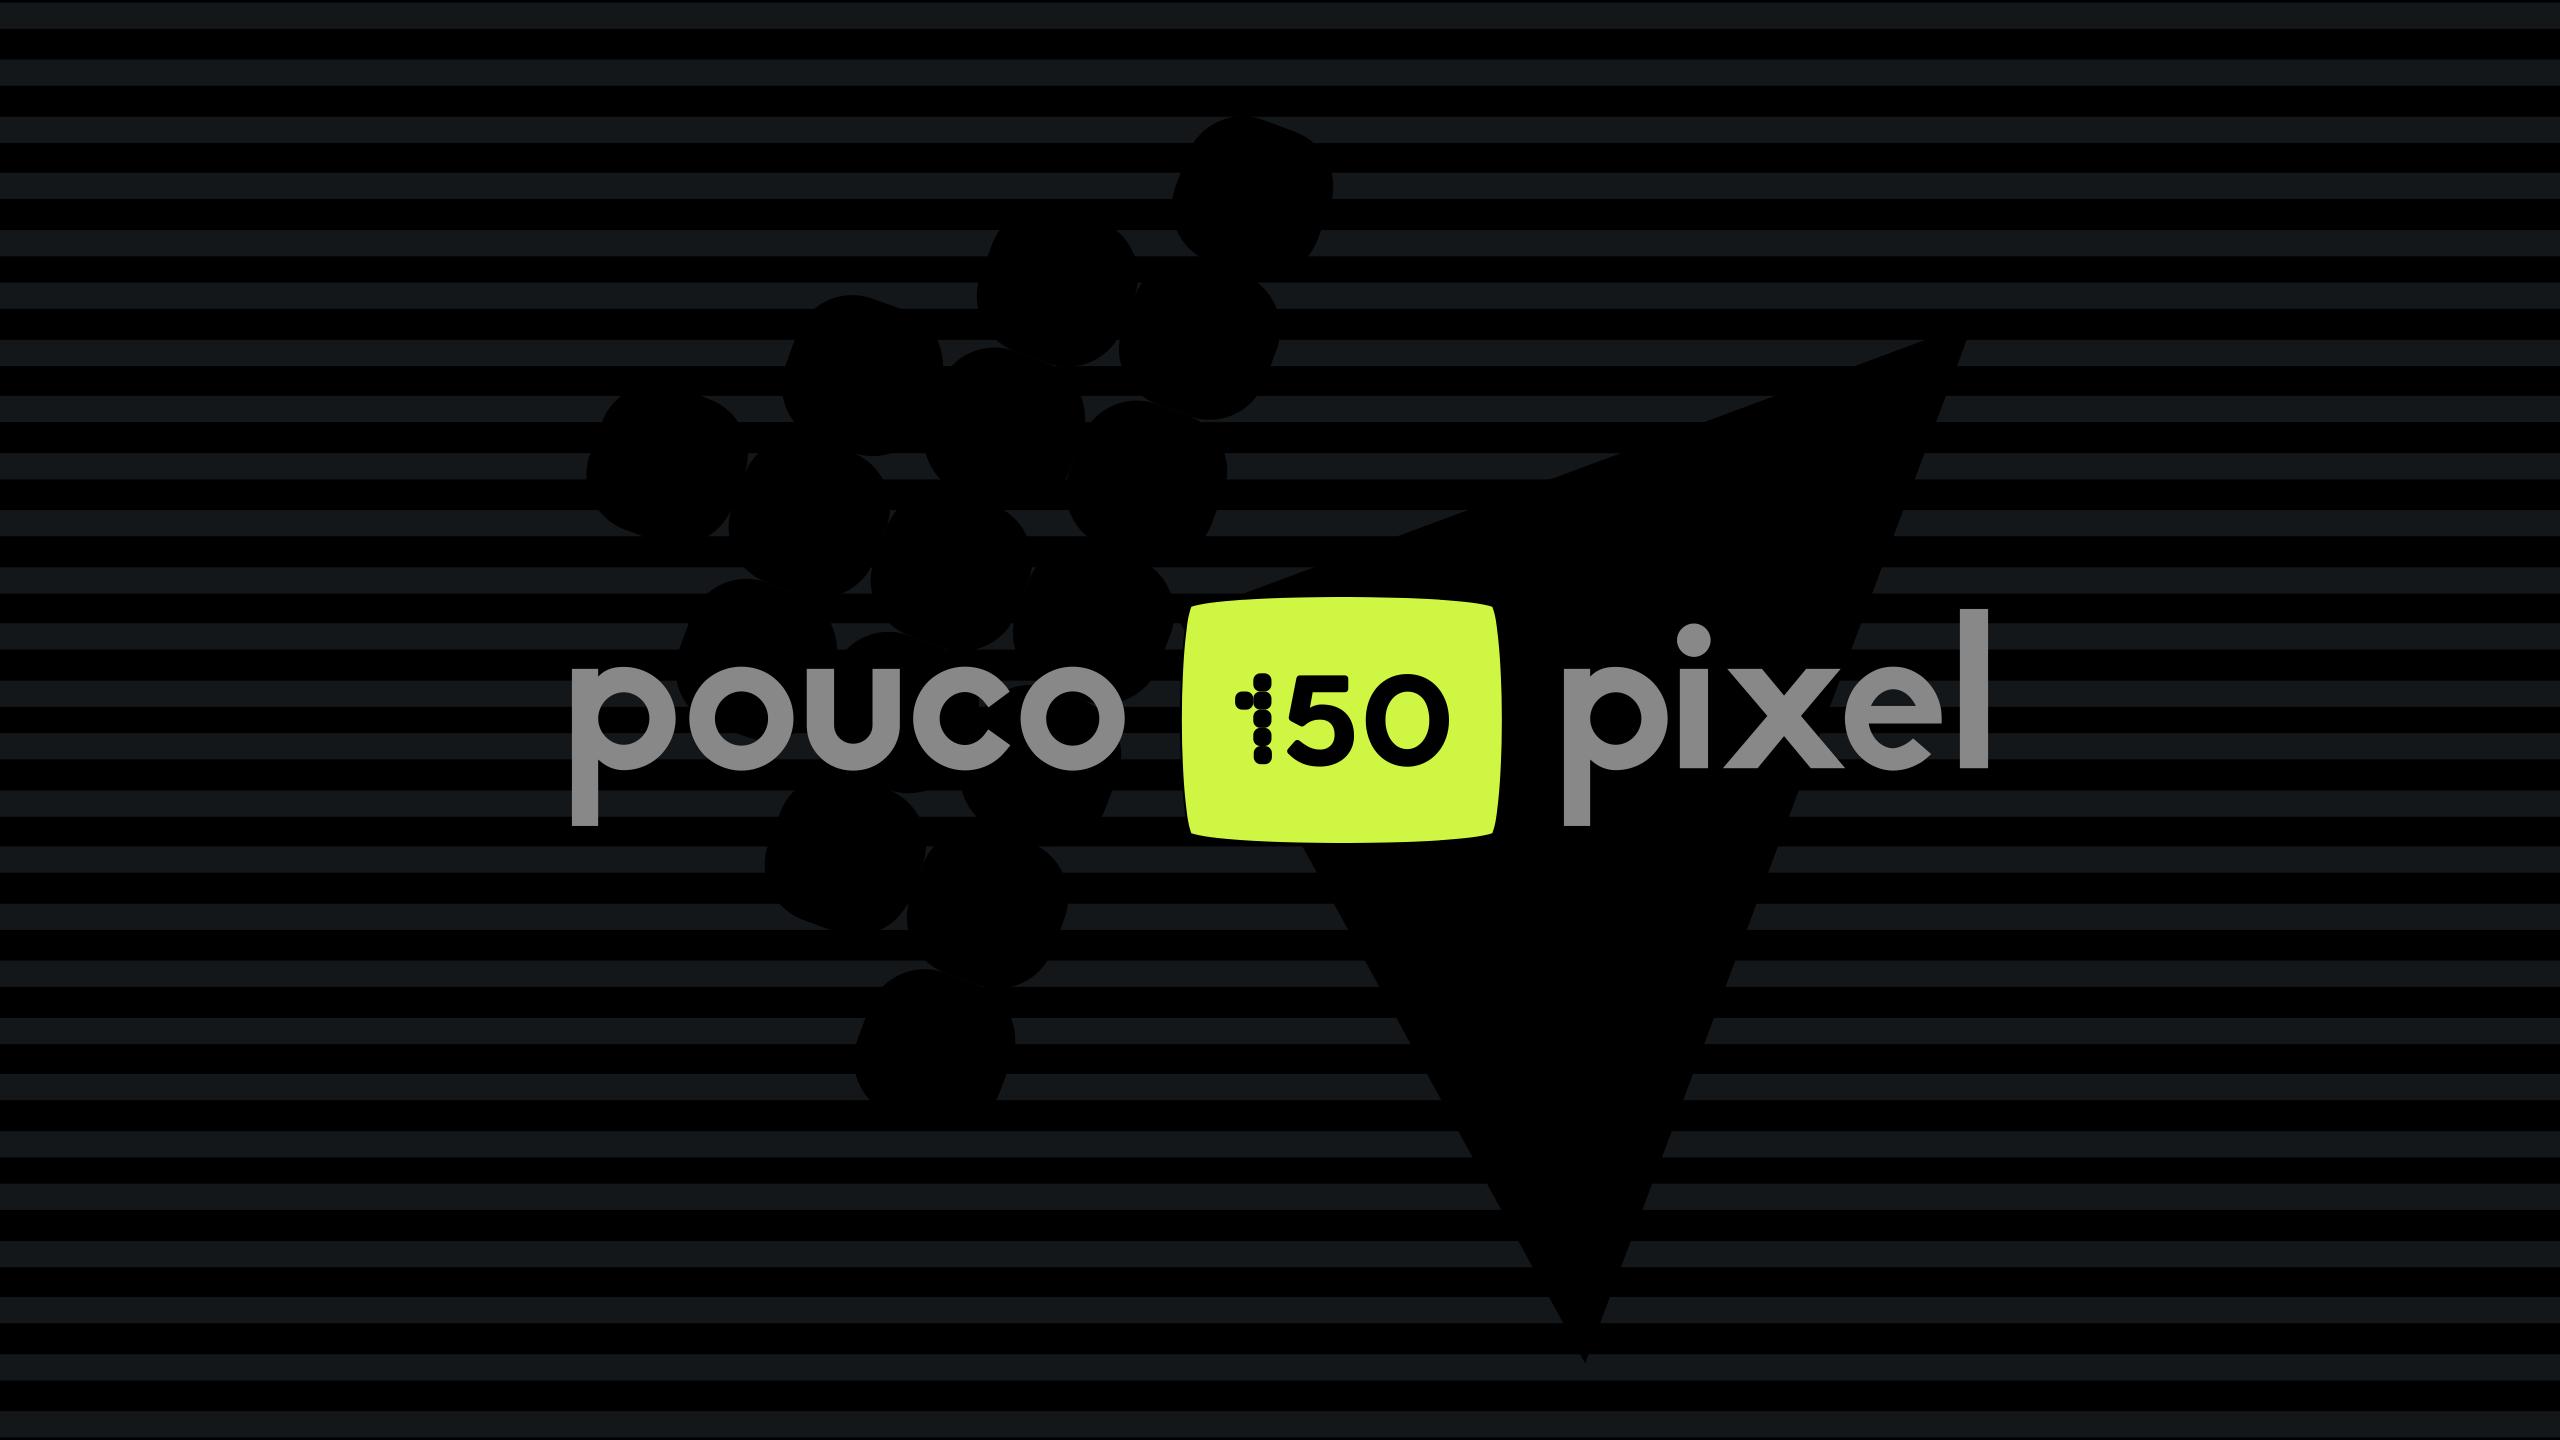 Pouco Pixel 150